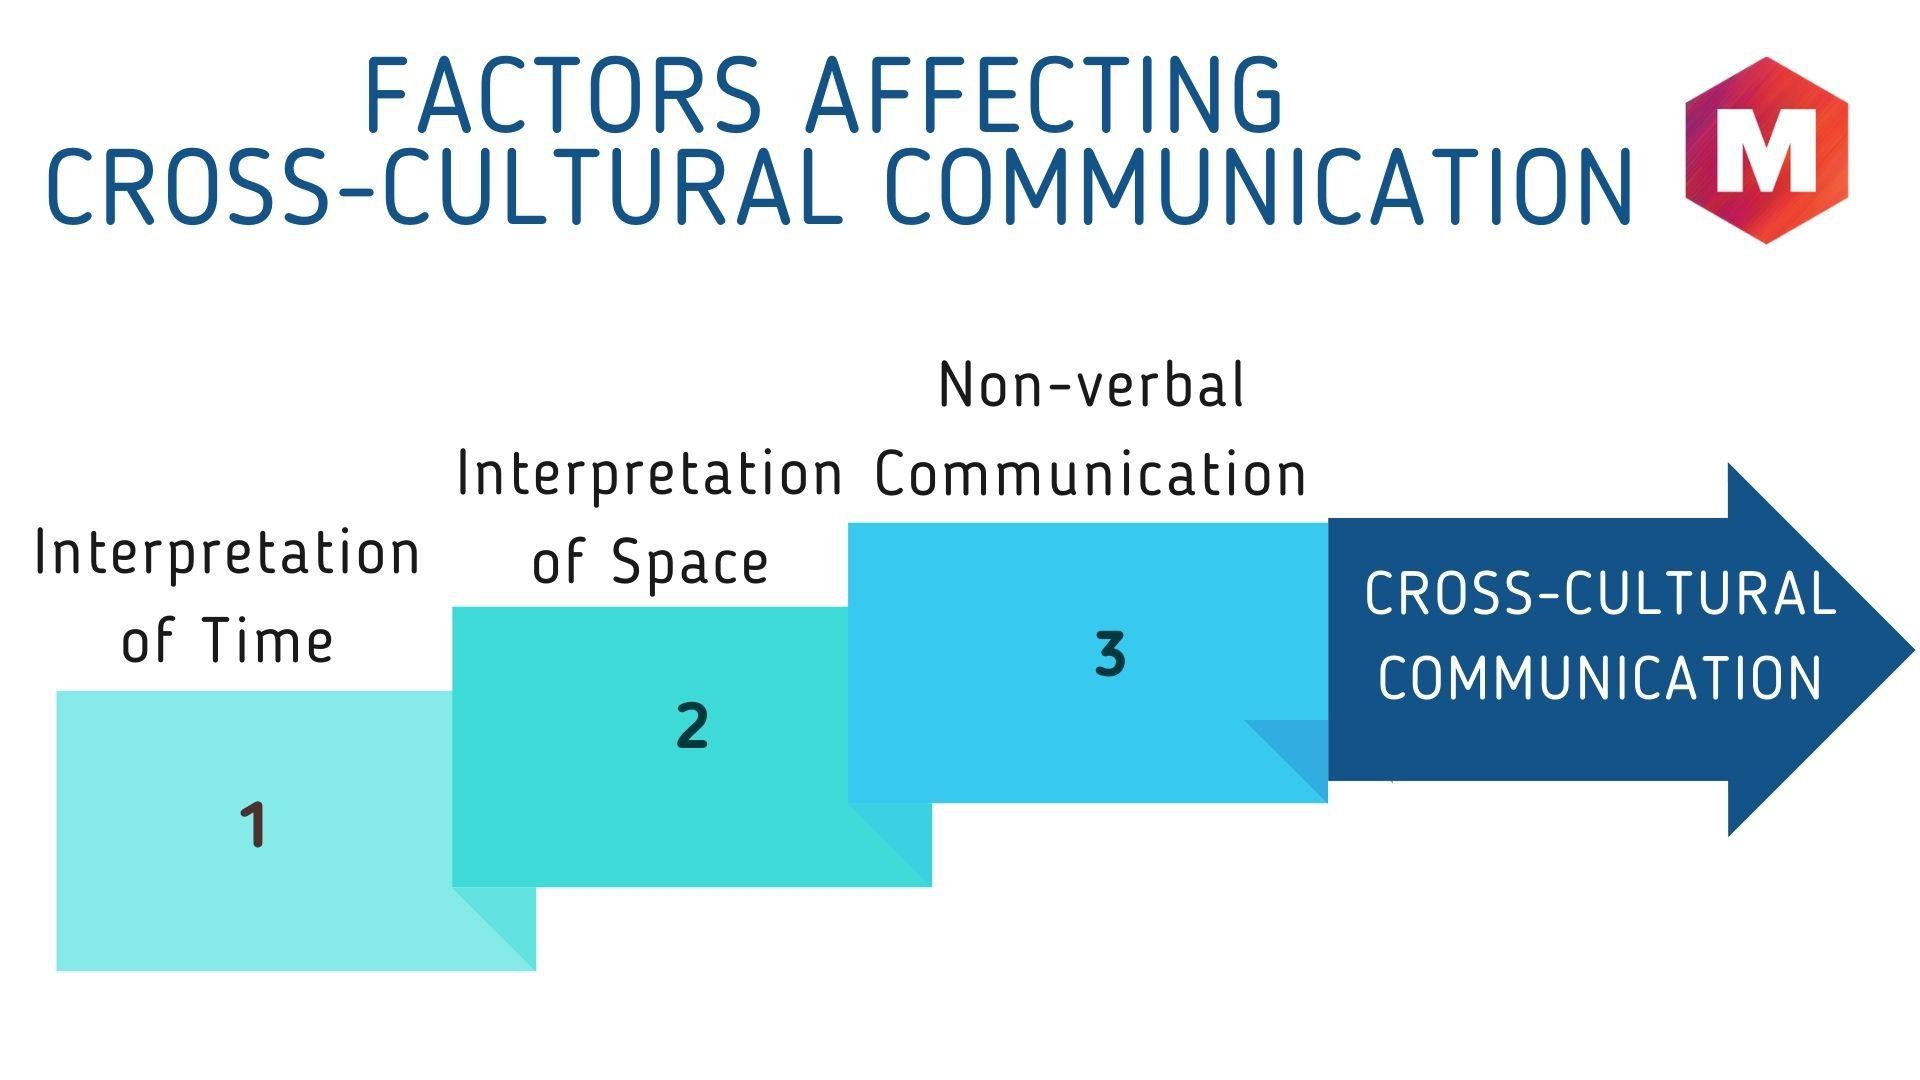 Factors affecting Cross-Cultural Communication